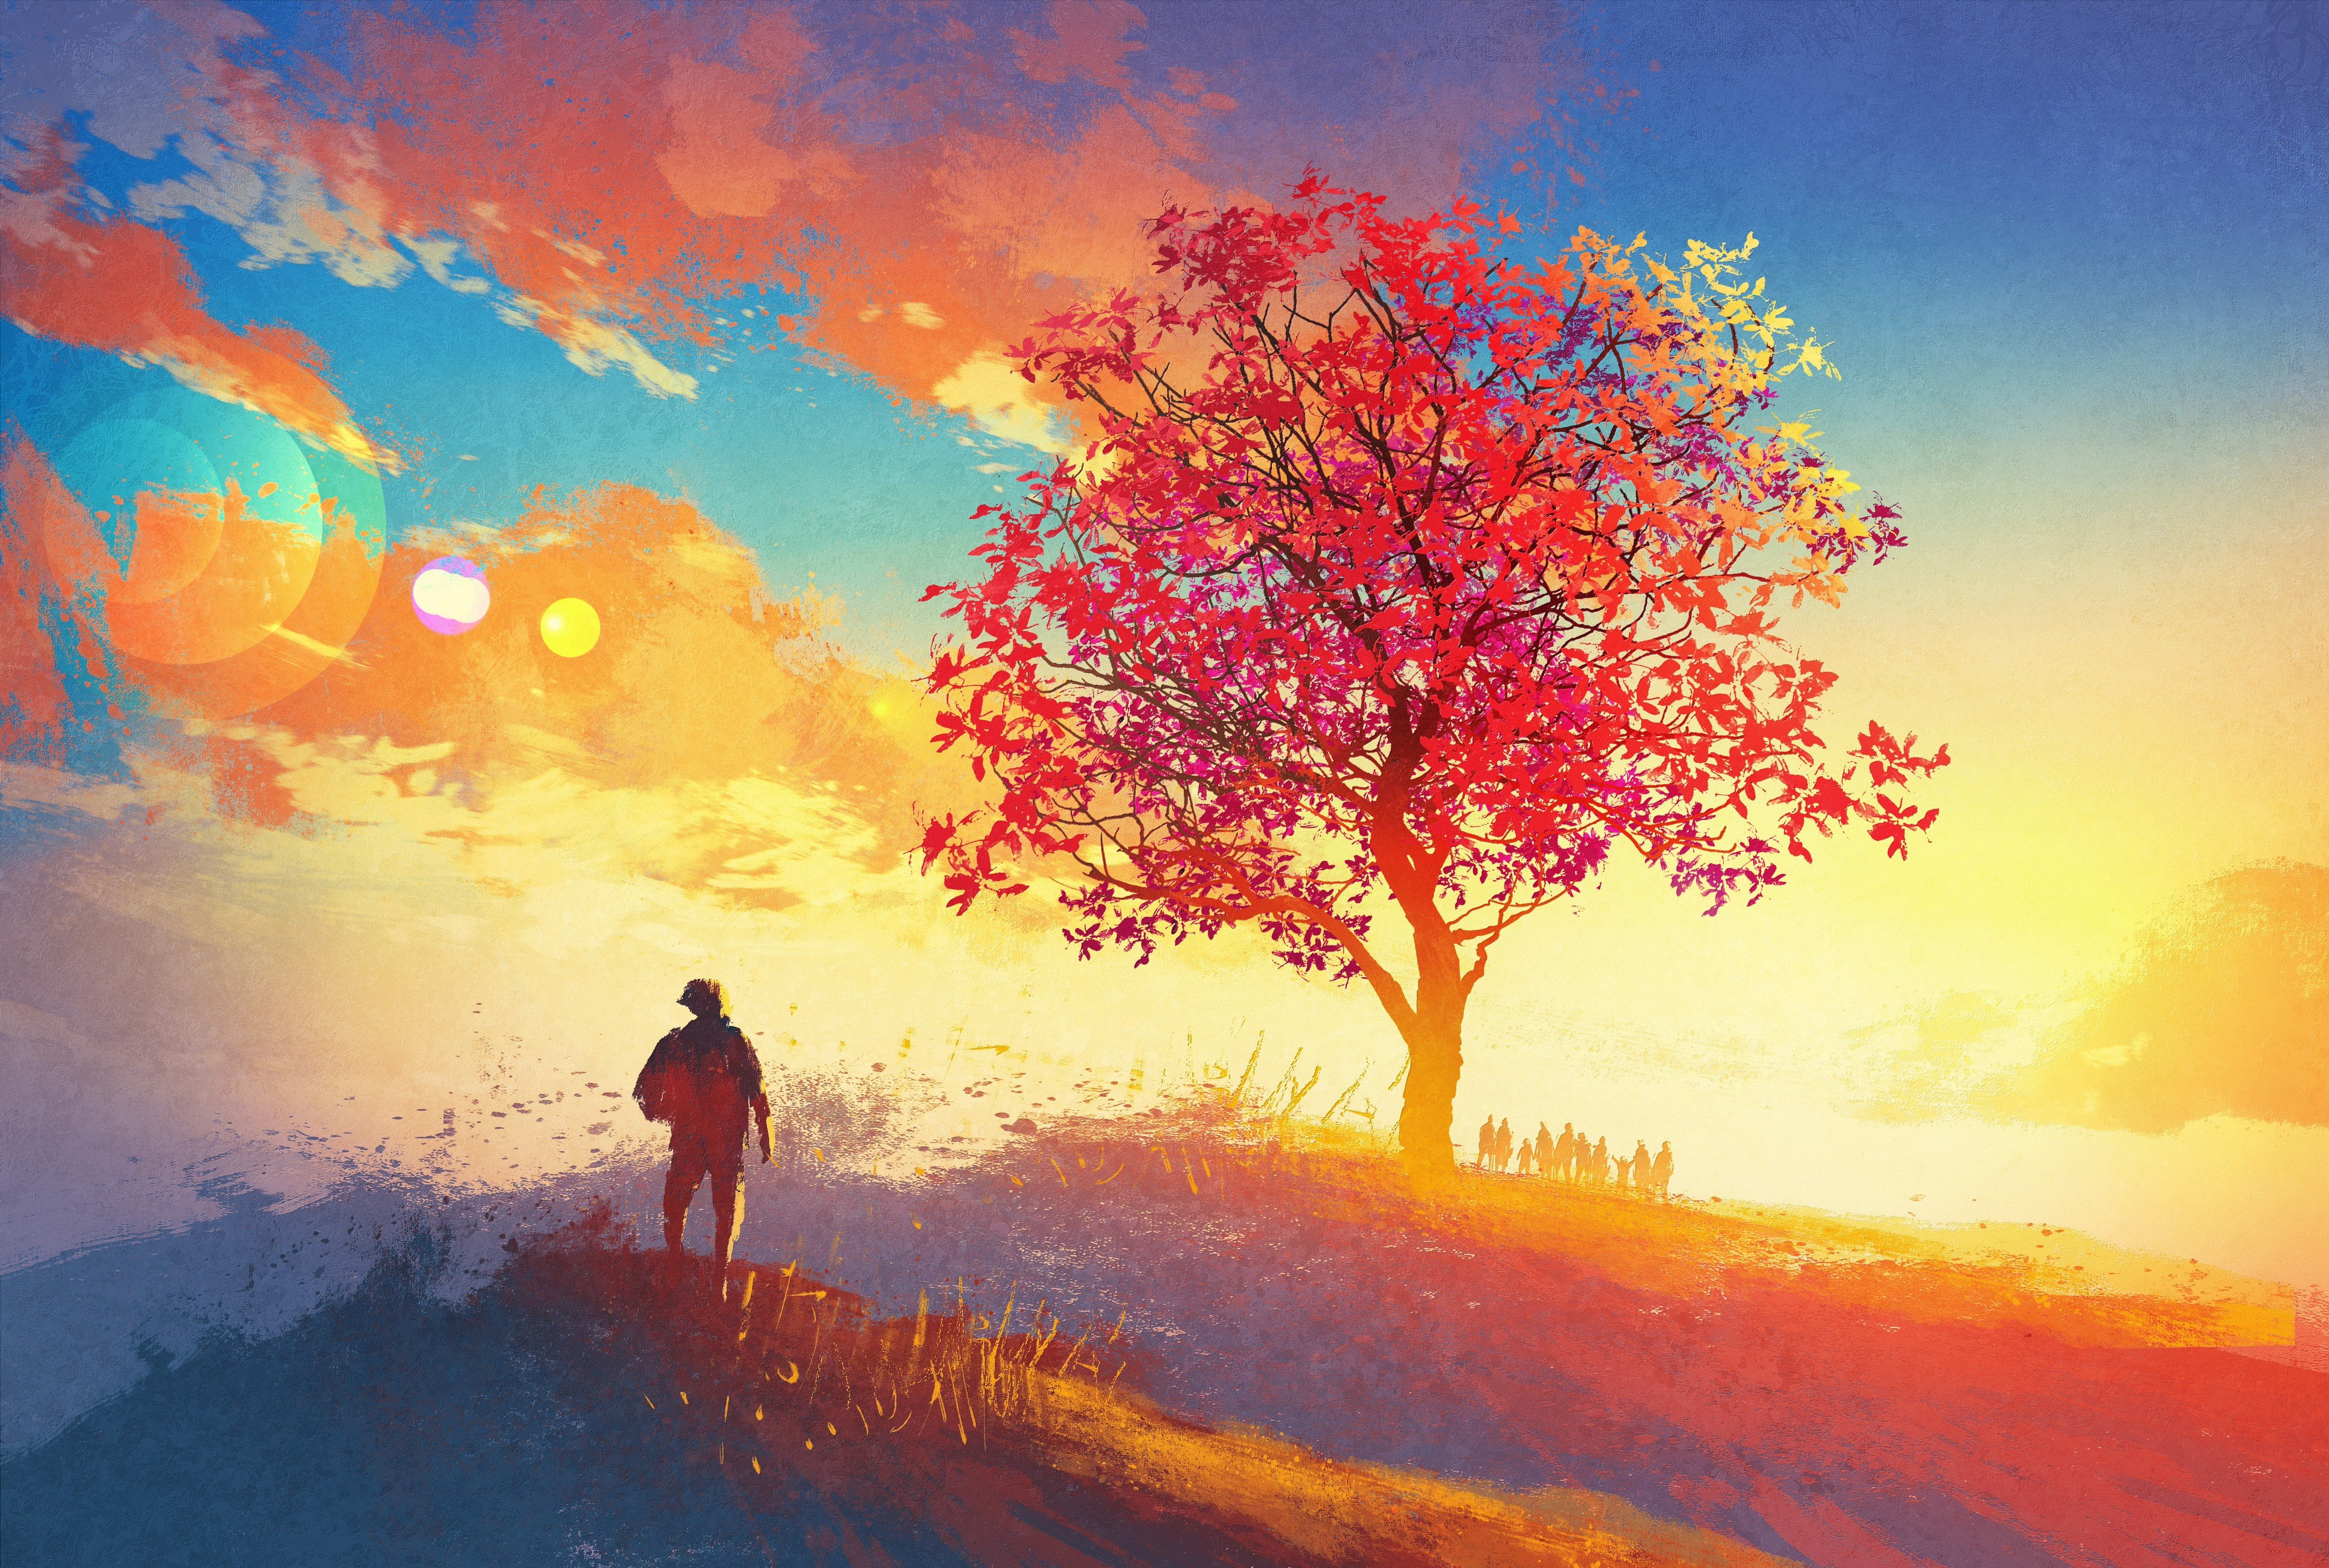 Abstract Art Red Sky Desktop Hd Artworks Desktop: Artwork, Colorful, Sunrise, Sky HD Wallpapers / Desktop